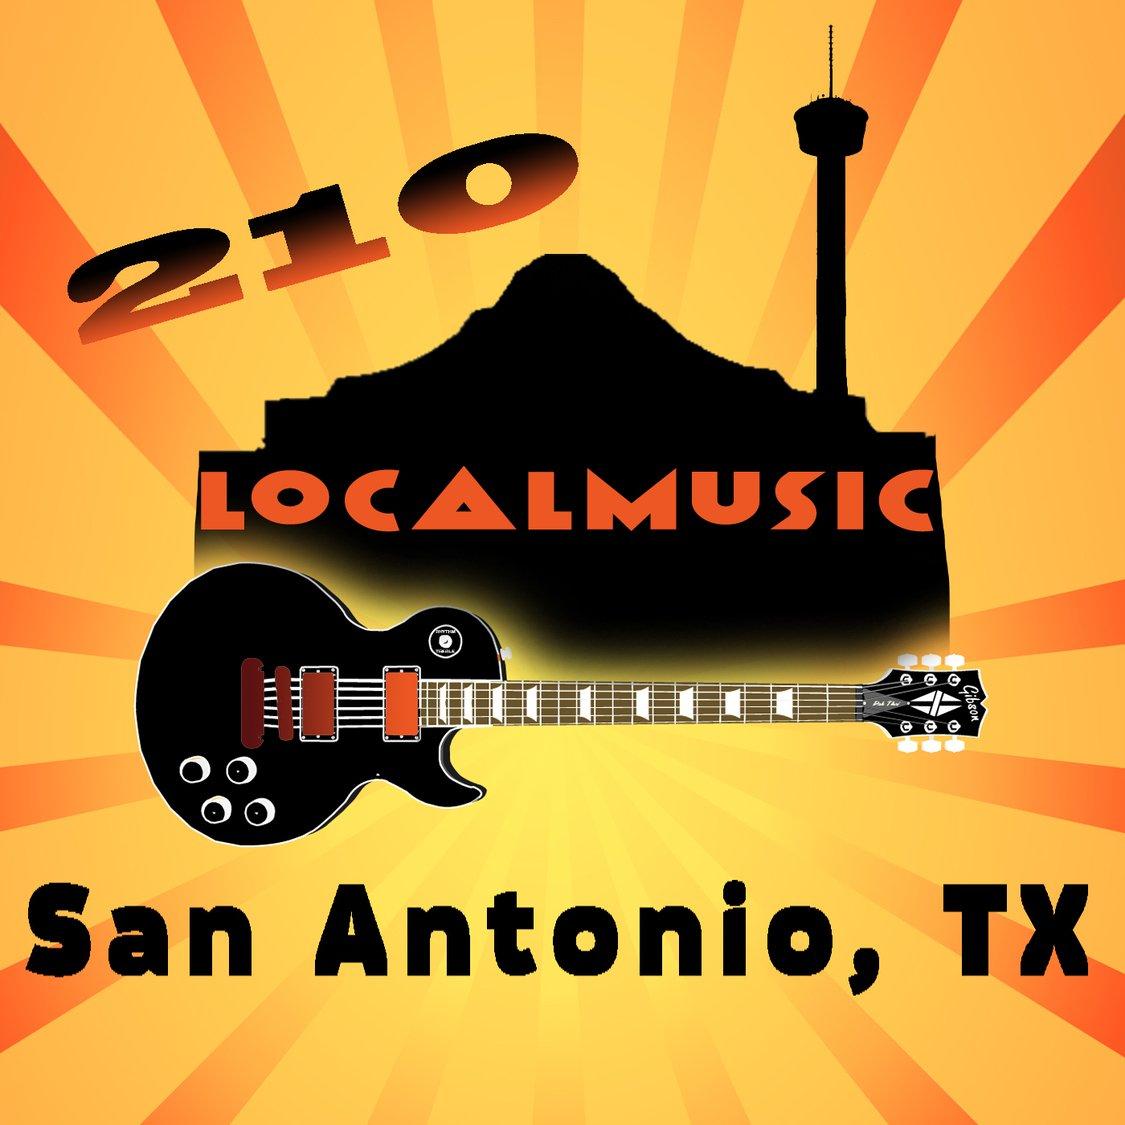 210 Local Media | Spoken Word from San Antonio, TX